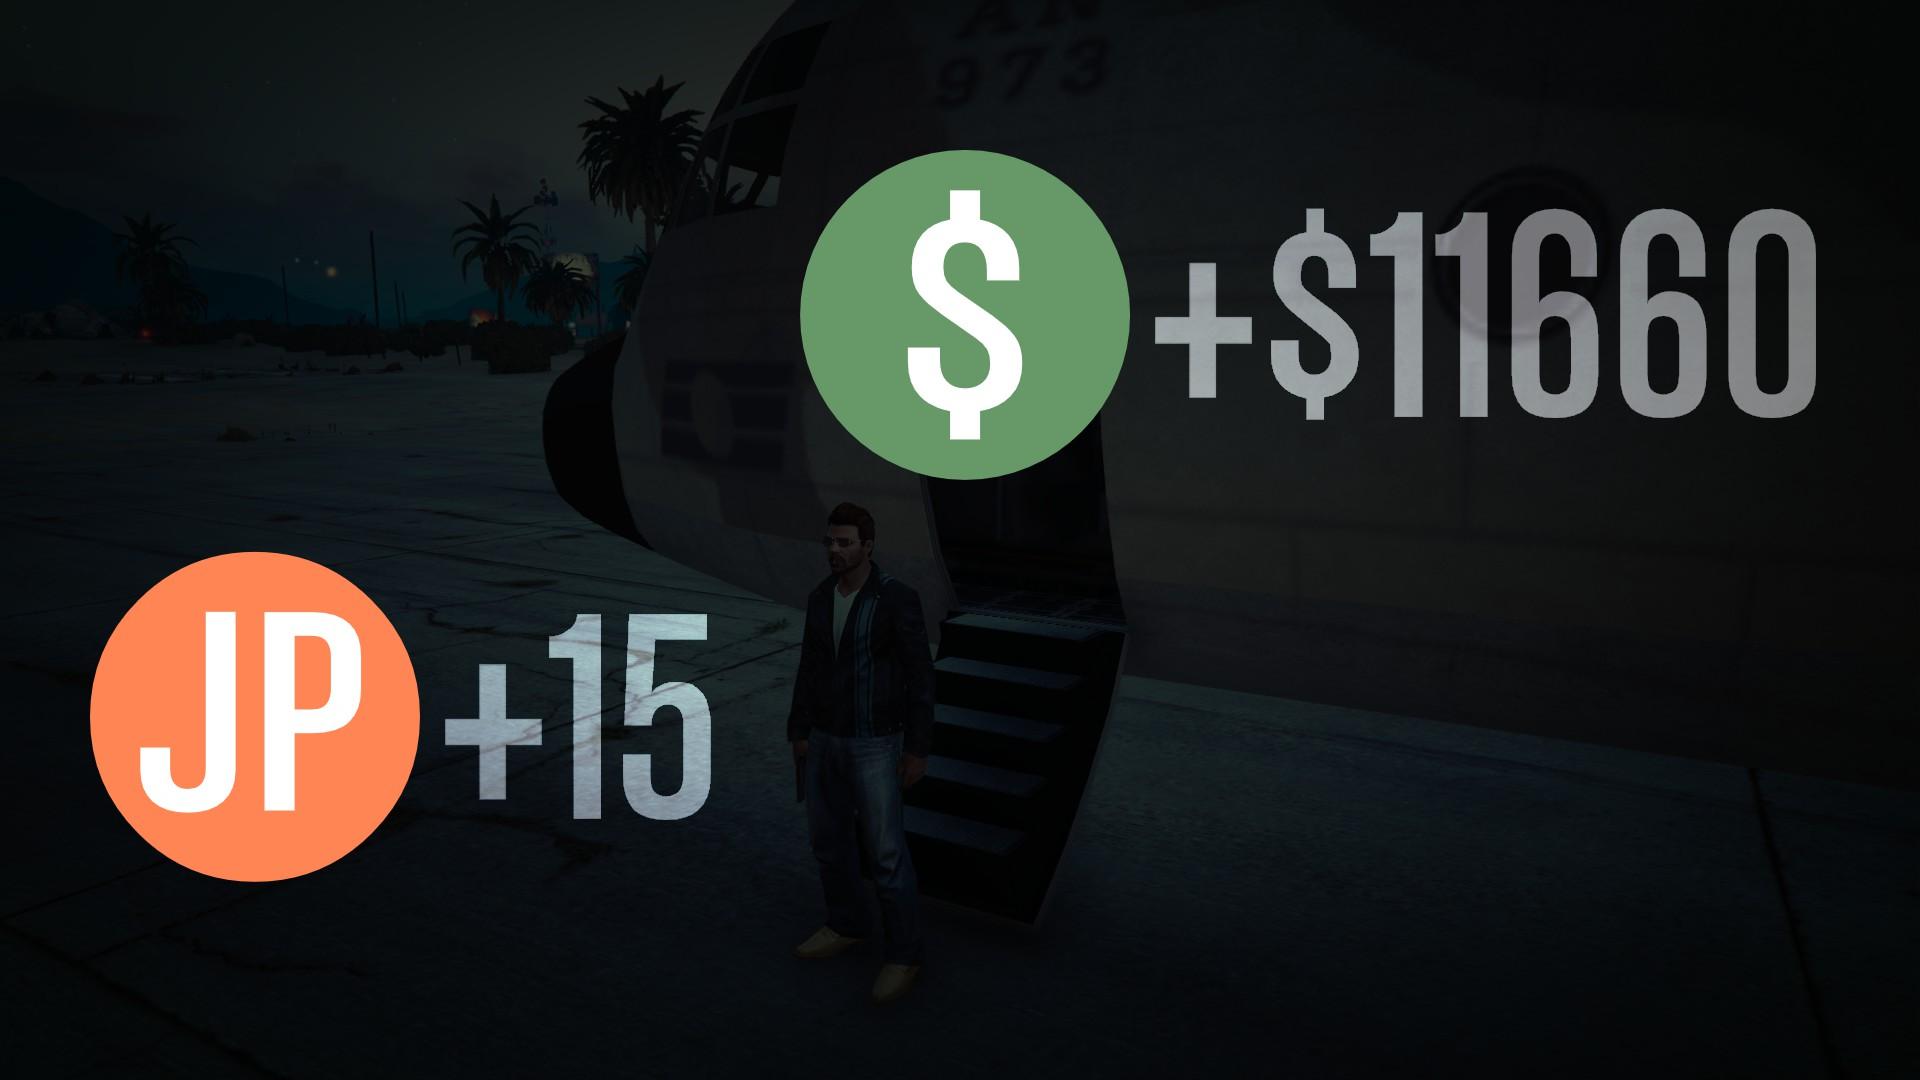 Gta 5 Geld Online